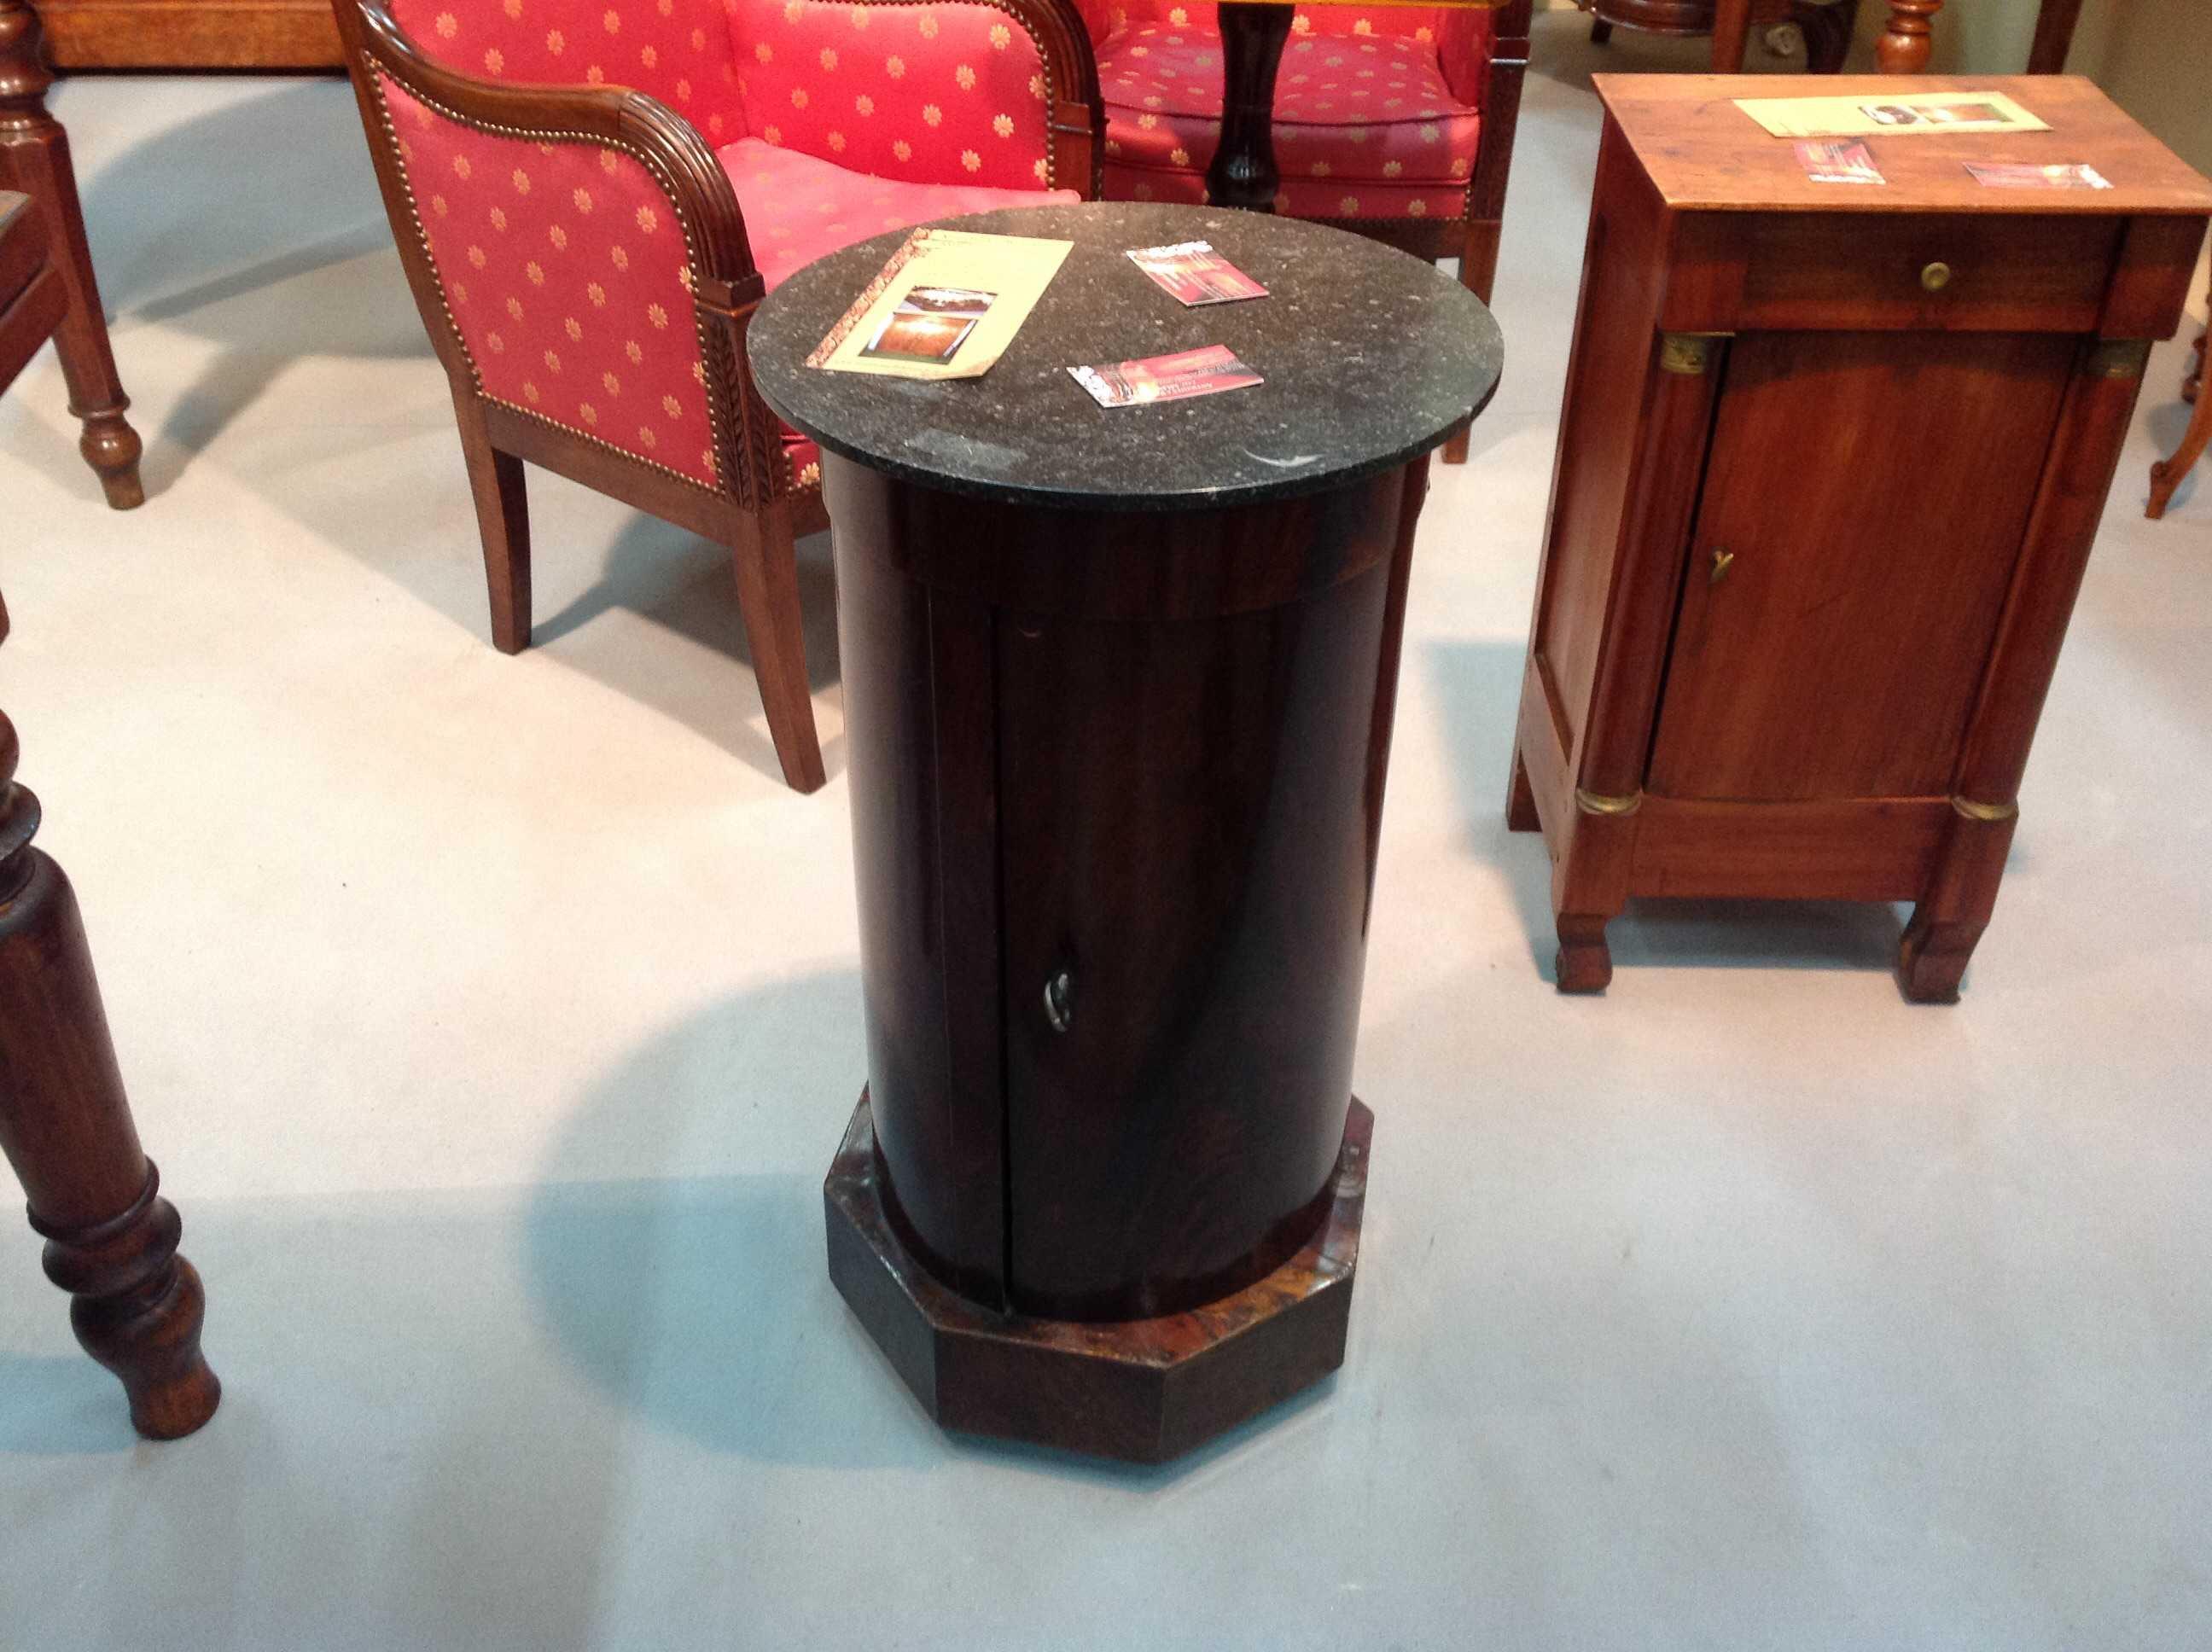 Impero restauro vendita antichit arredamento for Antiquariato mobili